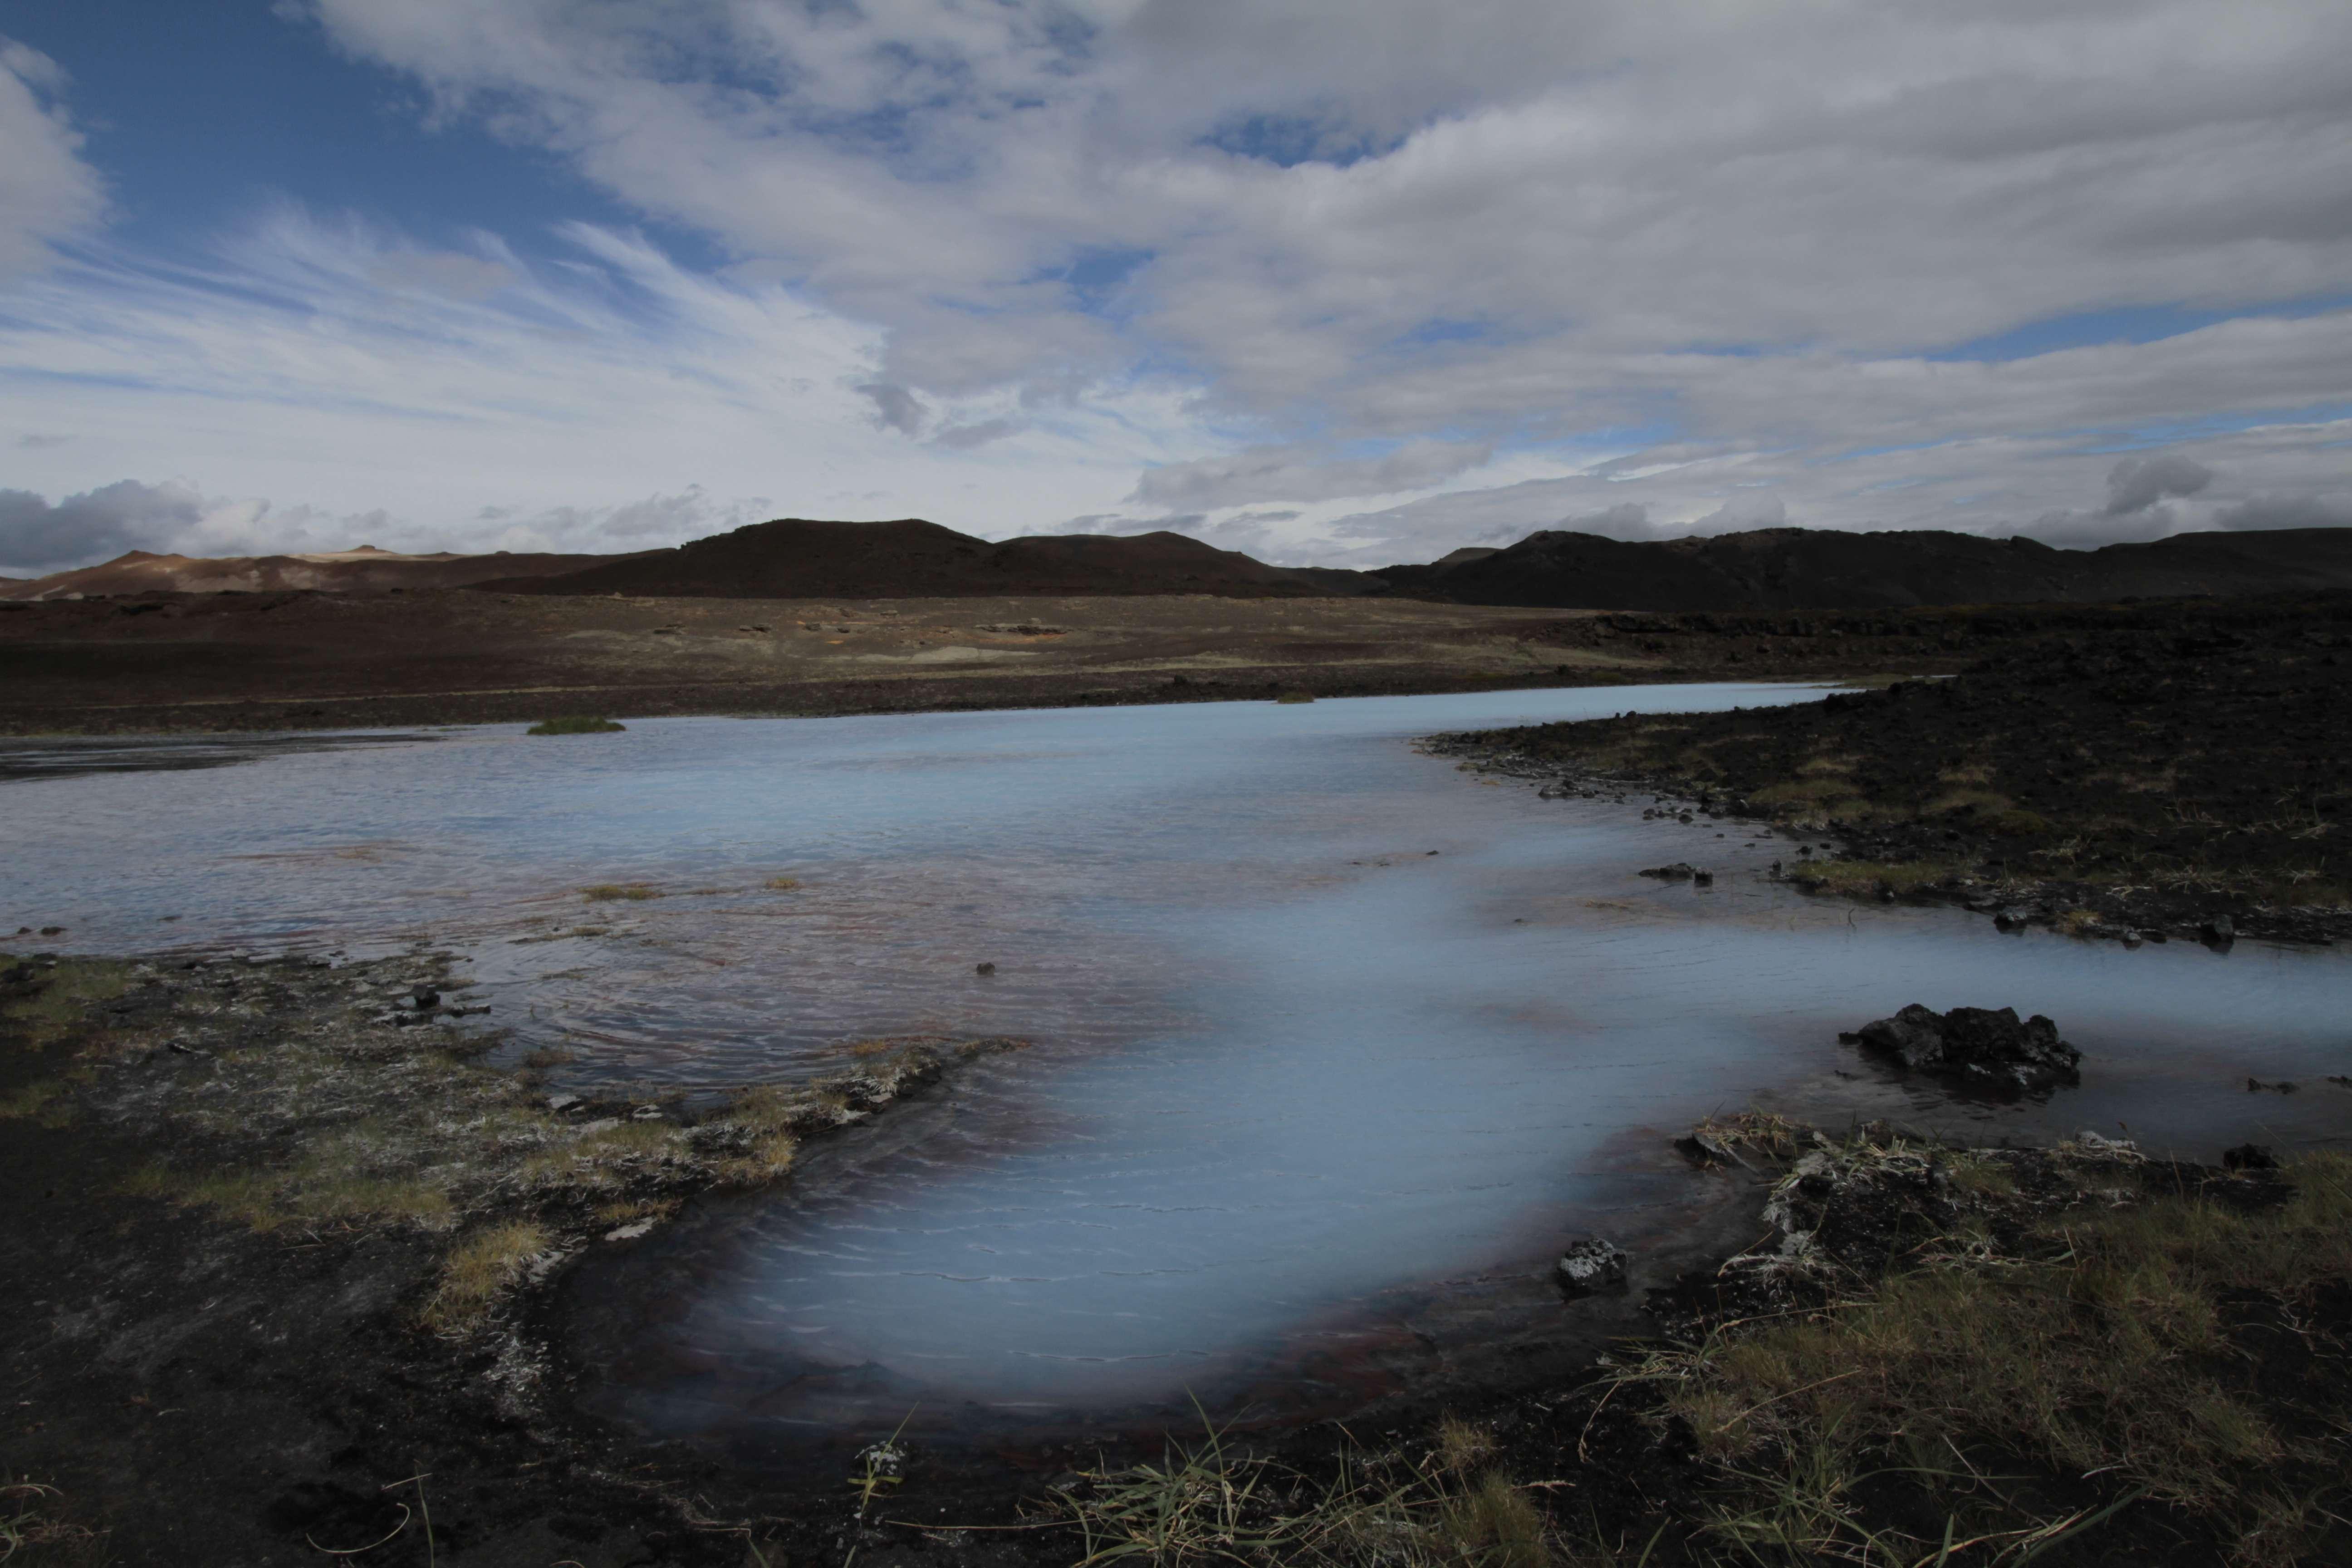 Islande_0264 rando Hofdi-Reykjahlid - Jardbodin 12 juillet